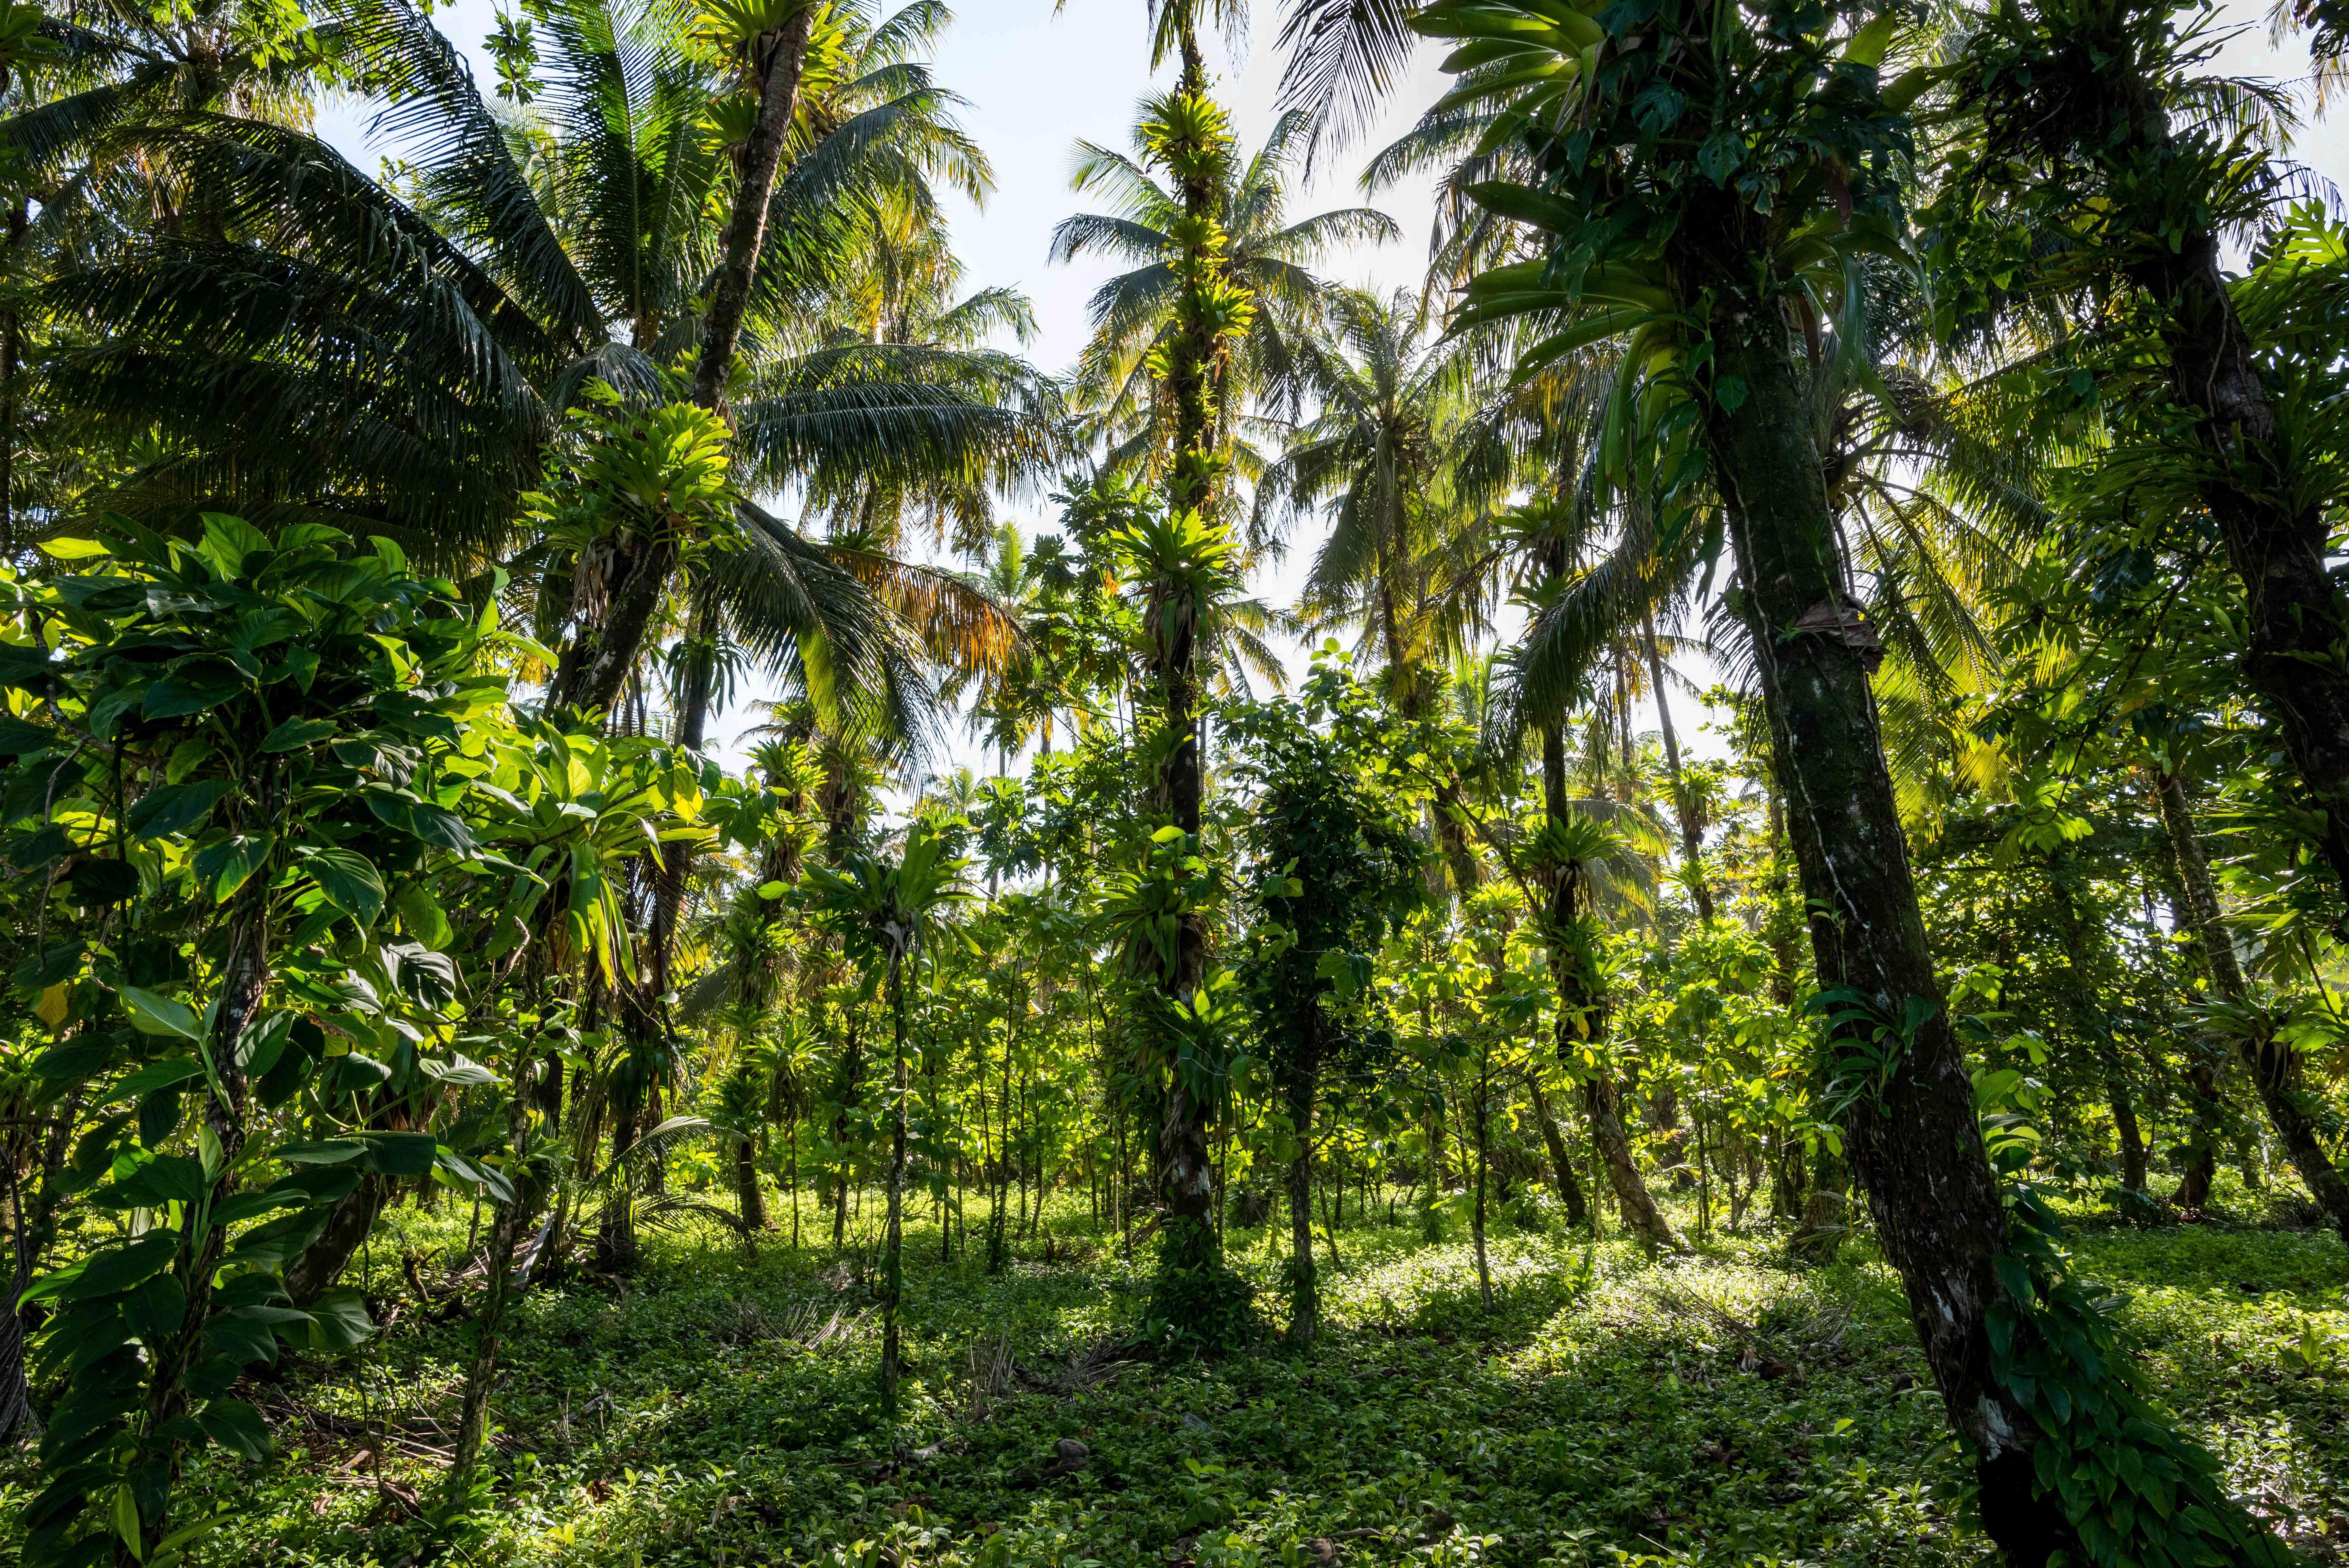 Palm tree jungle on Bocas del Toro